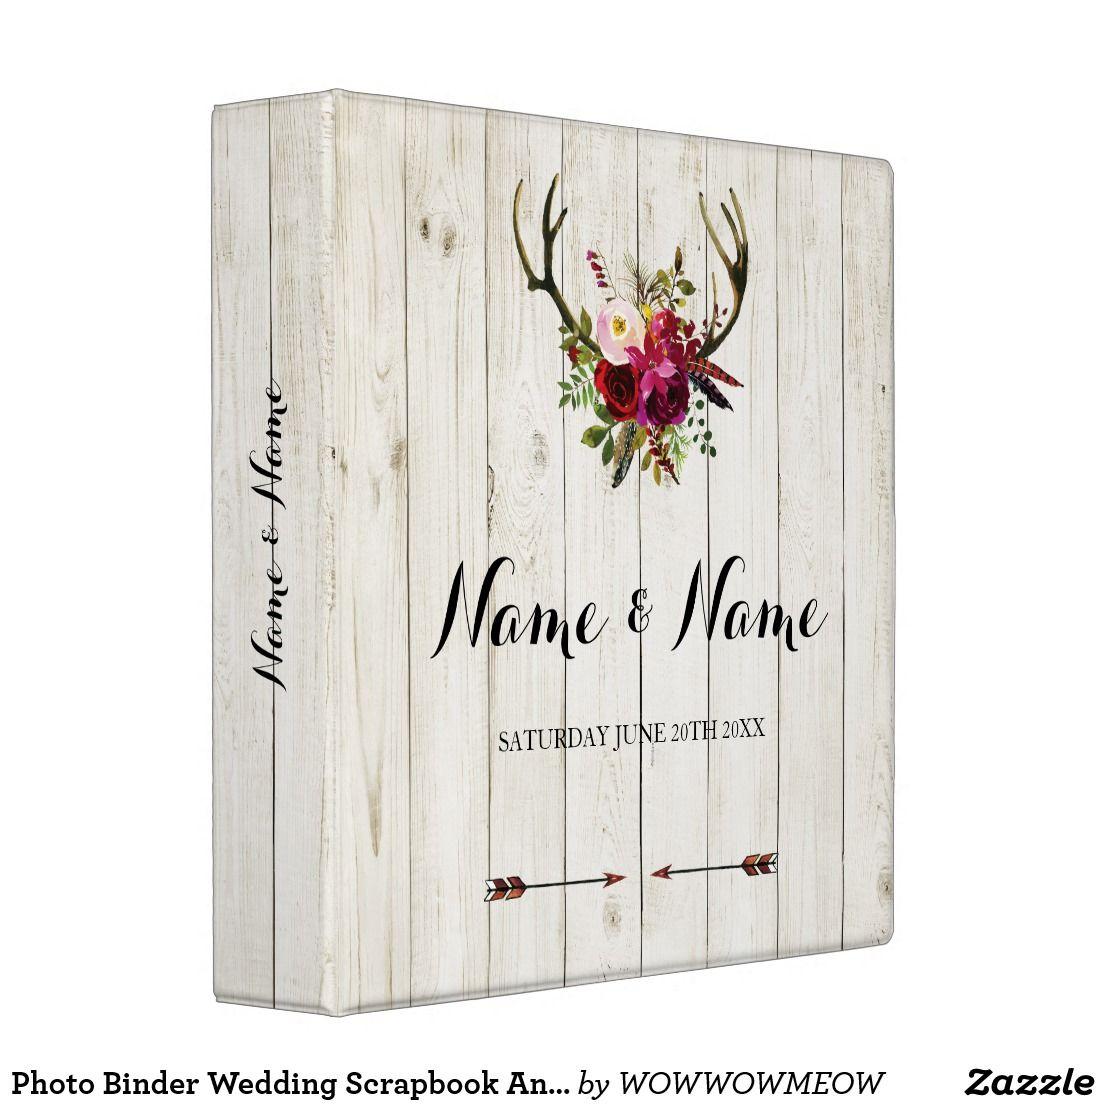 Photo Binder Wedding Scrapbook Antlers Rustic